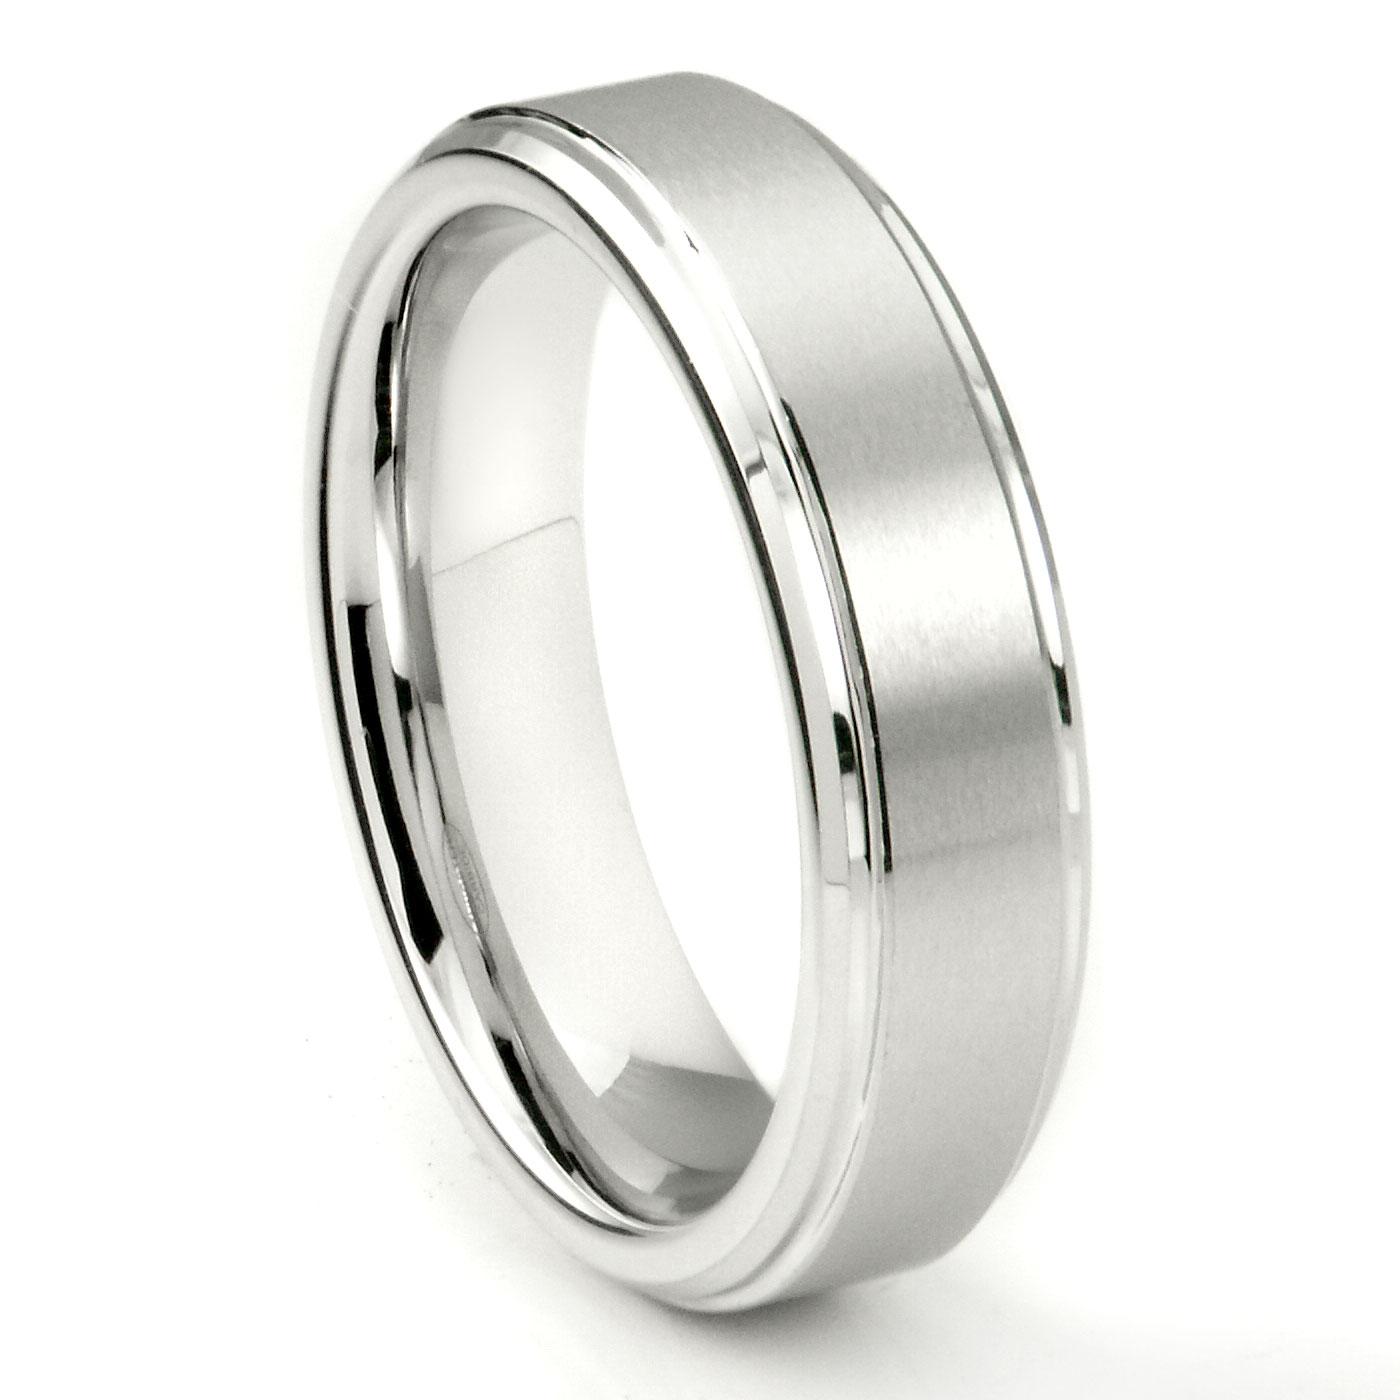 Mens Tungsten Rings & Wedding Bands Titanium Kay